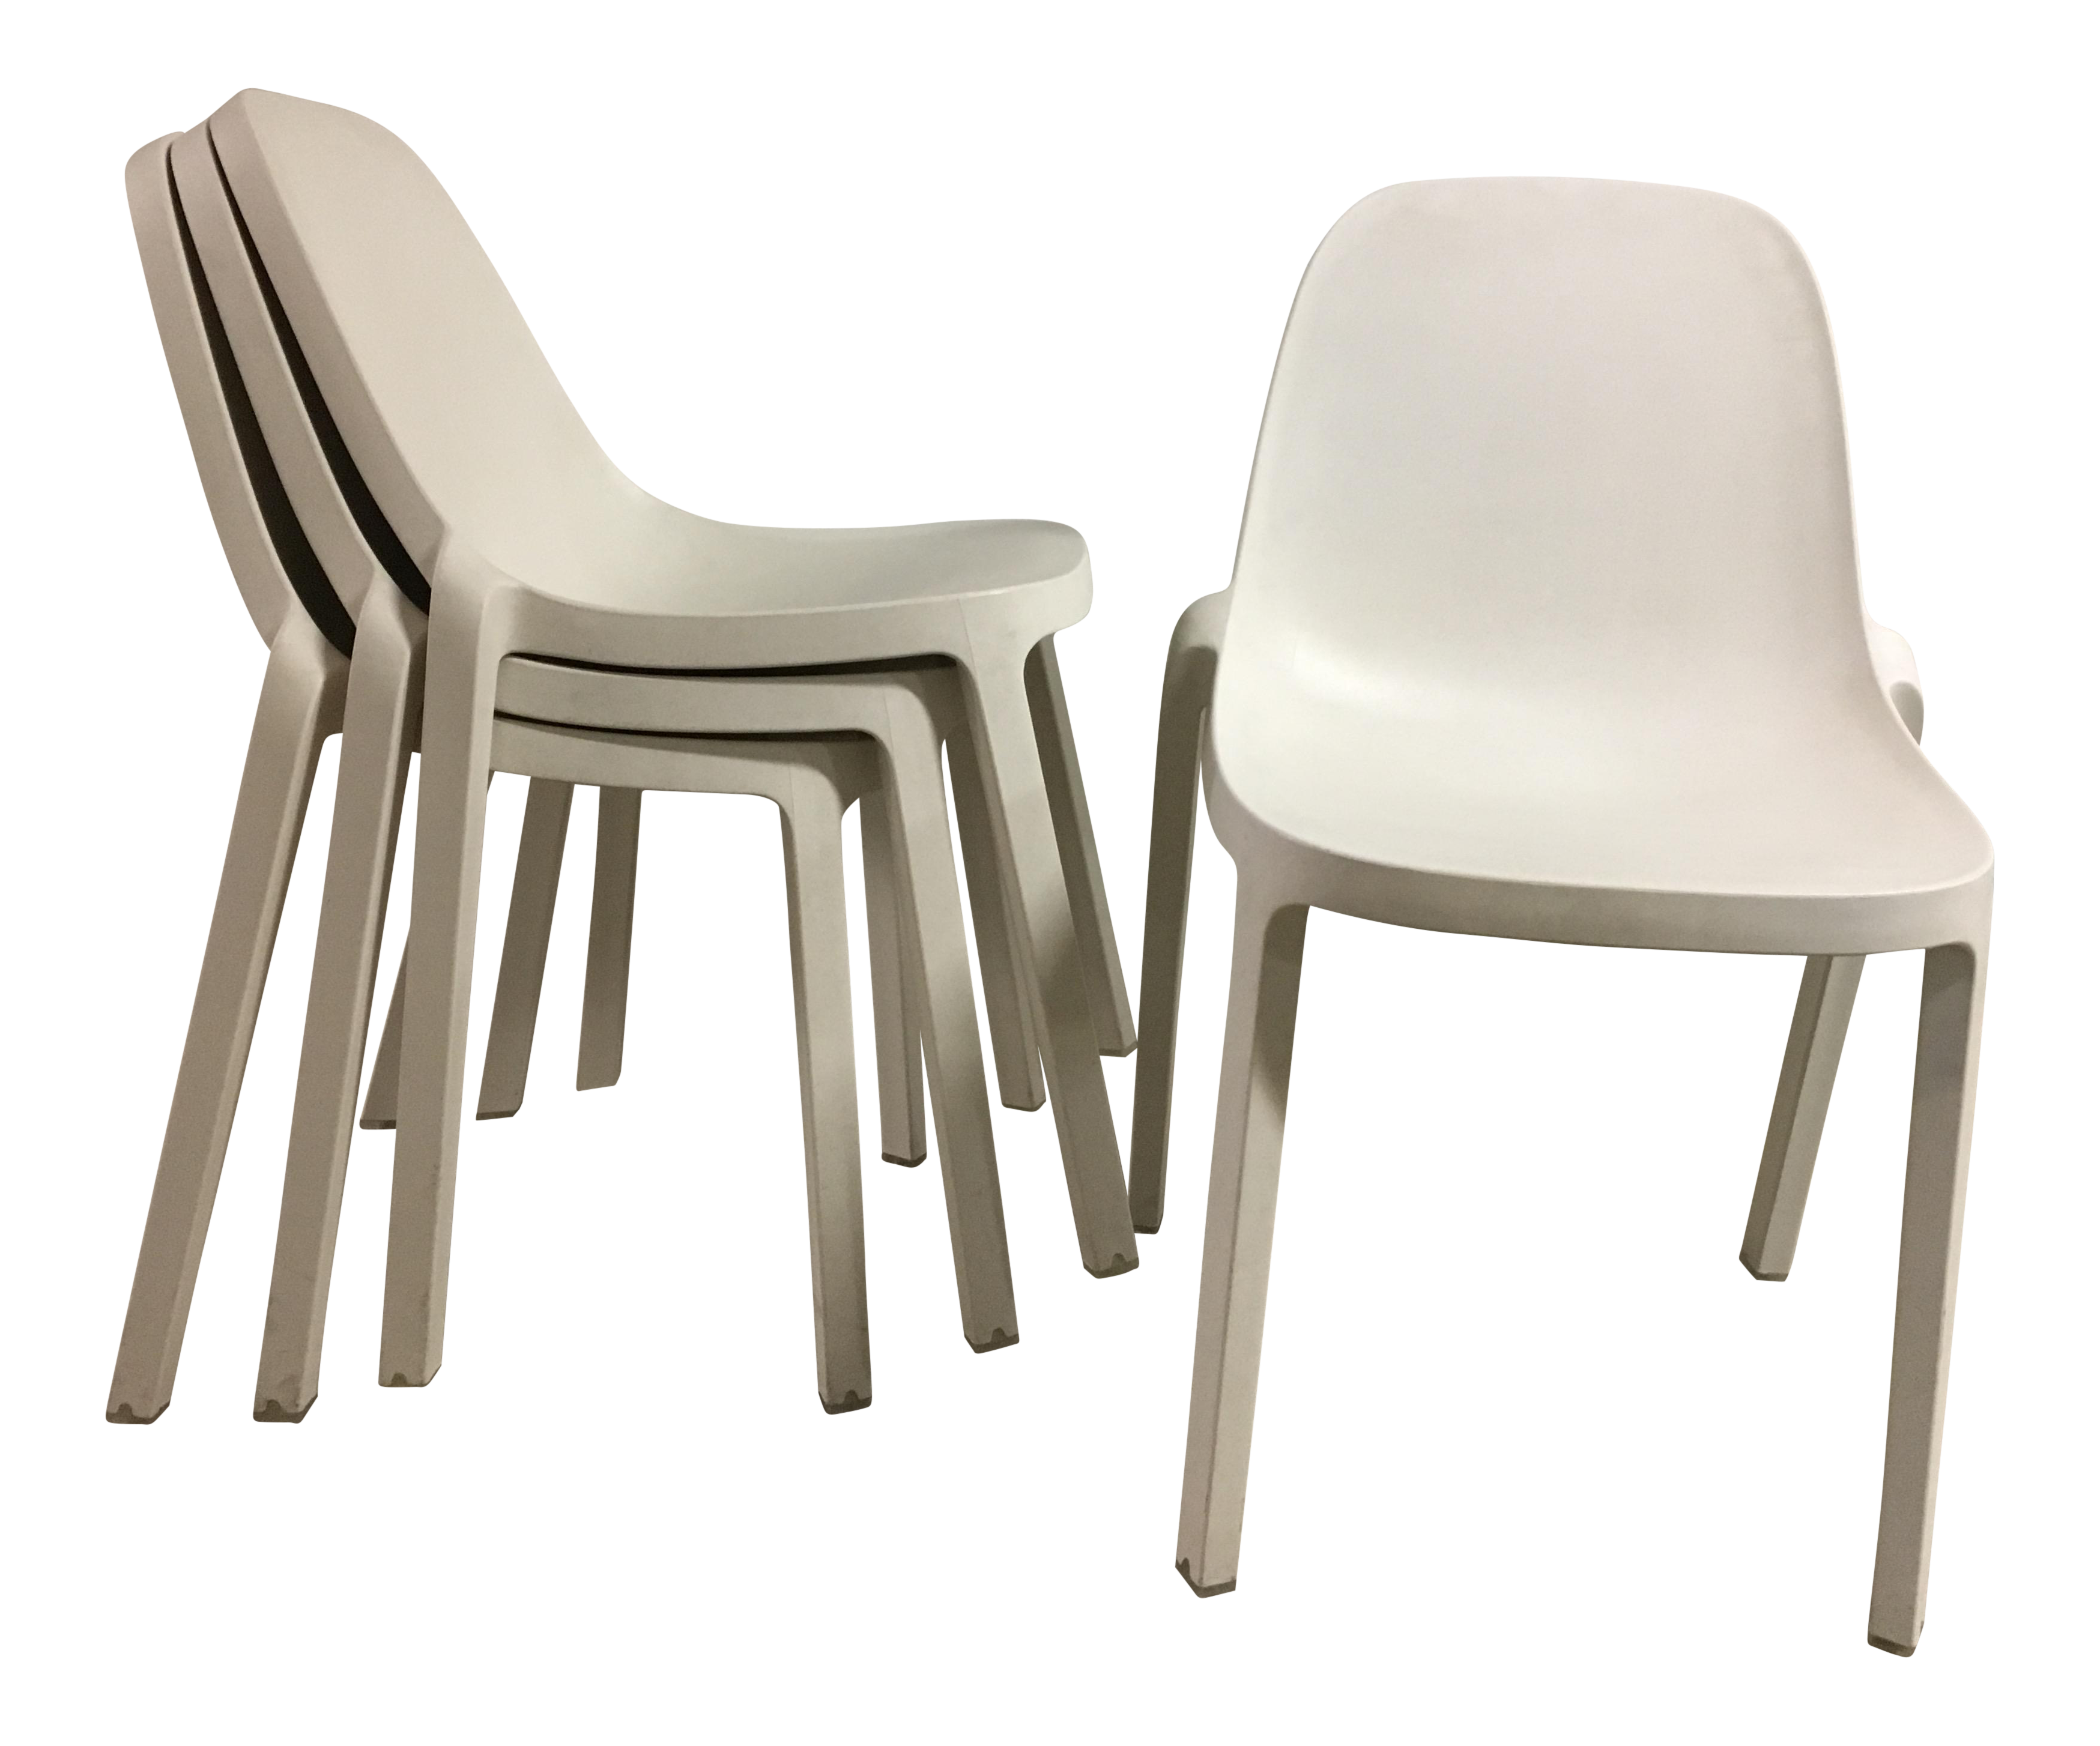 Philippe Starck For Emeco Broom Chairs Set Of 4 Chairish